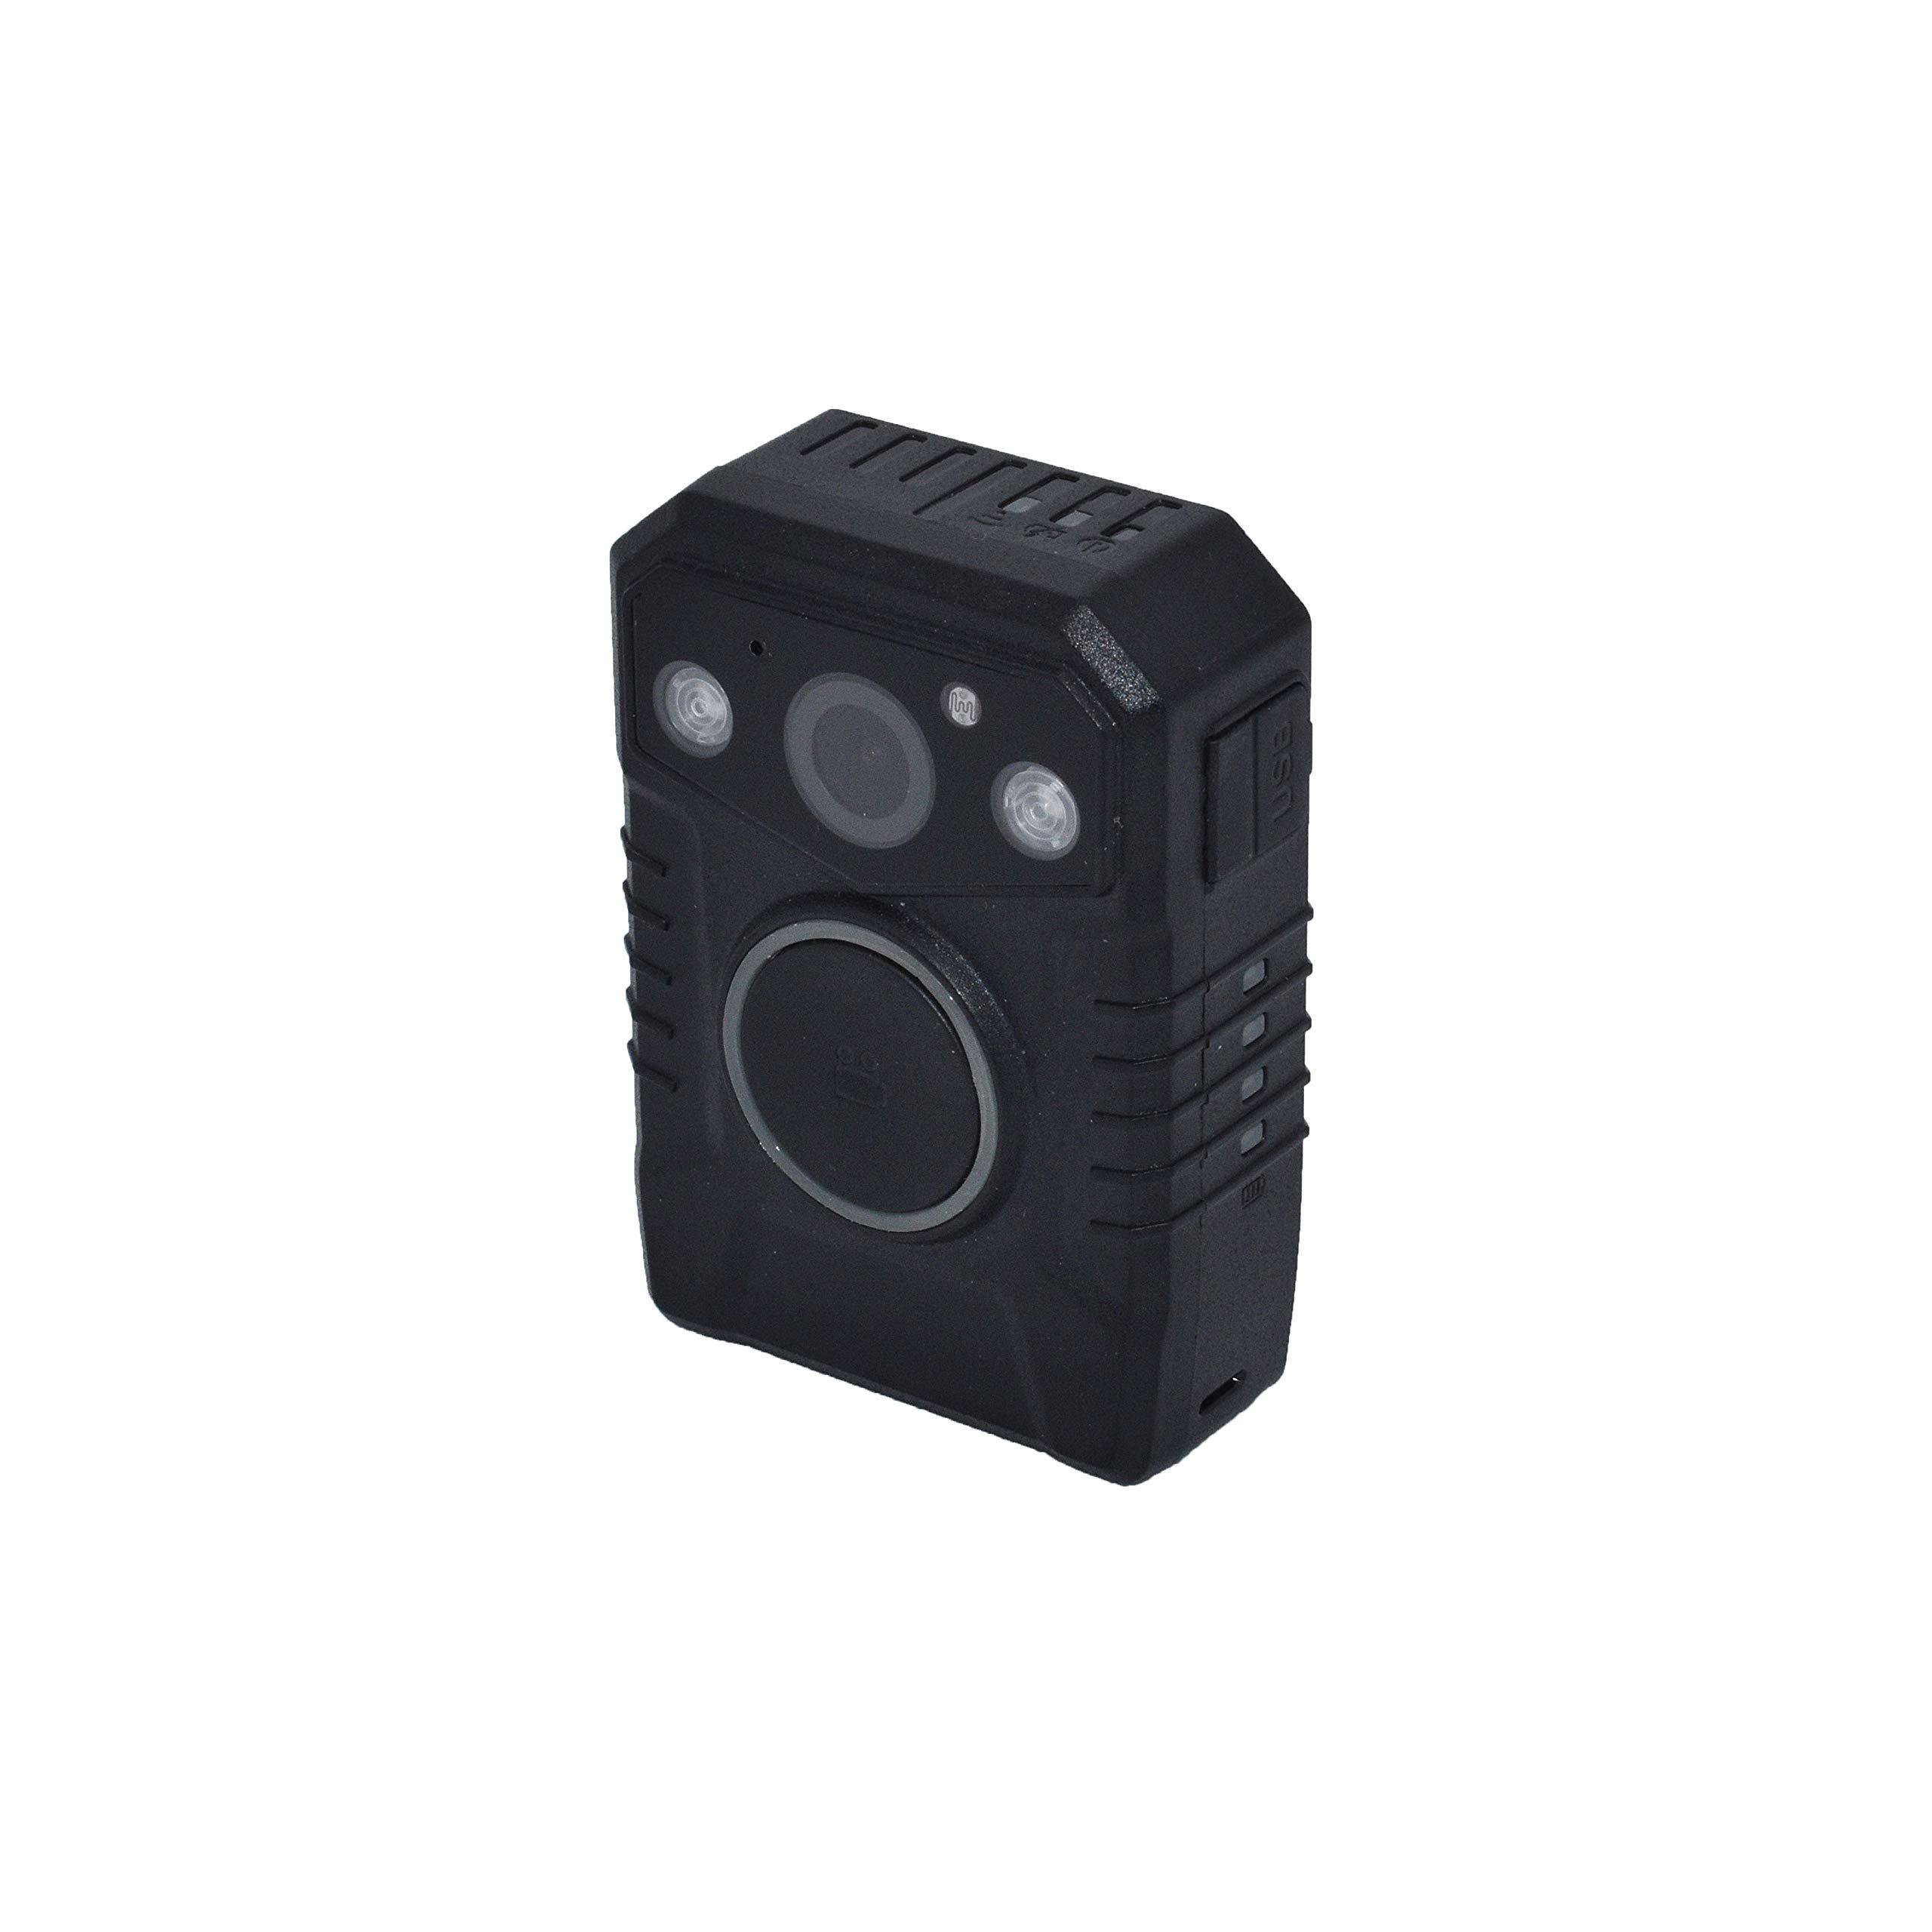 Minigadgets PCNVGPS1080P: Police Body Camera w/Night Vision, GPS Tracking, HDR